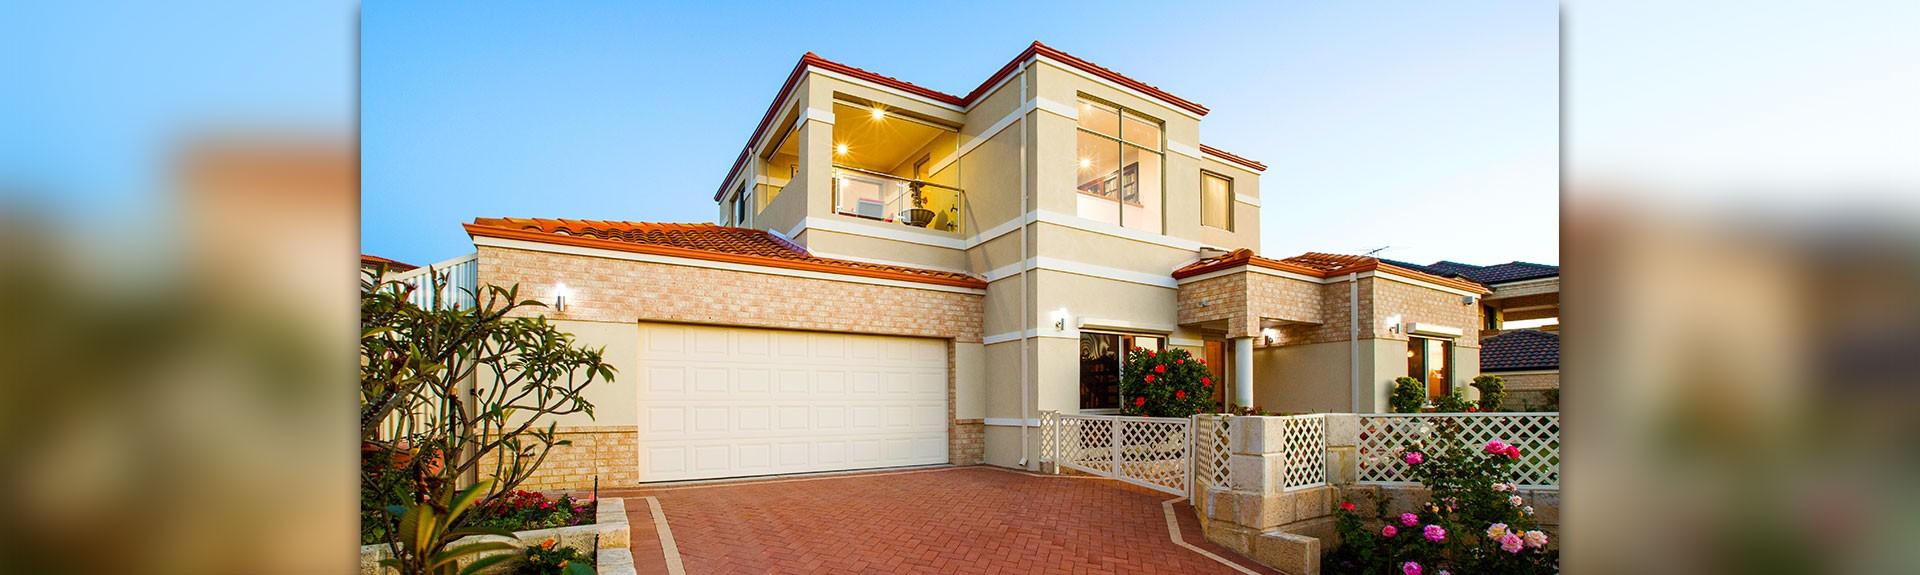 Modular vs traditional home building methods Modular home vs regular home